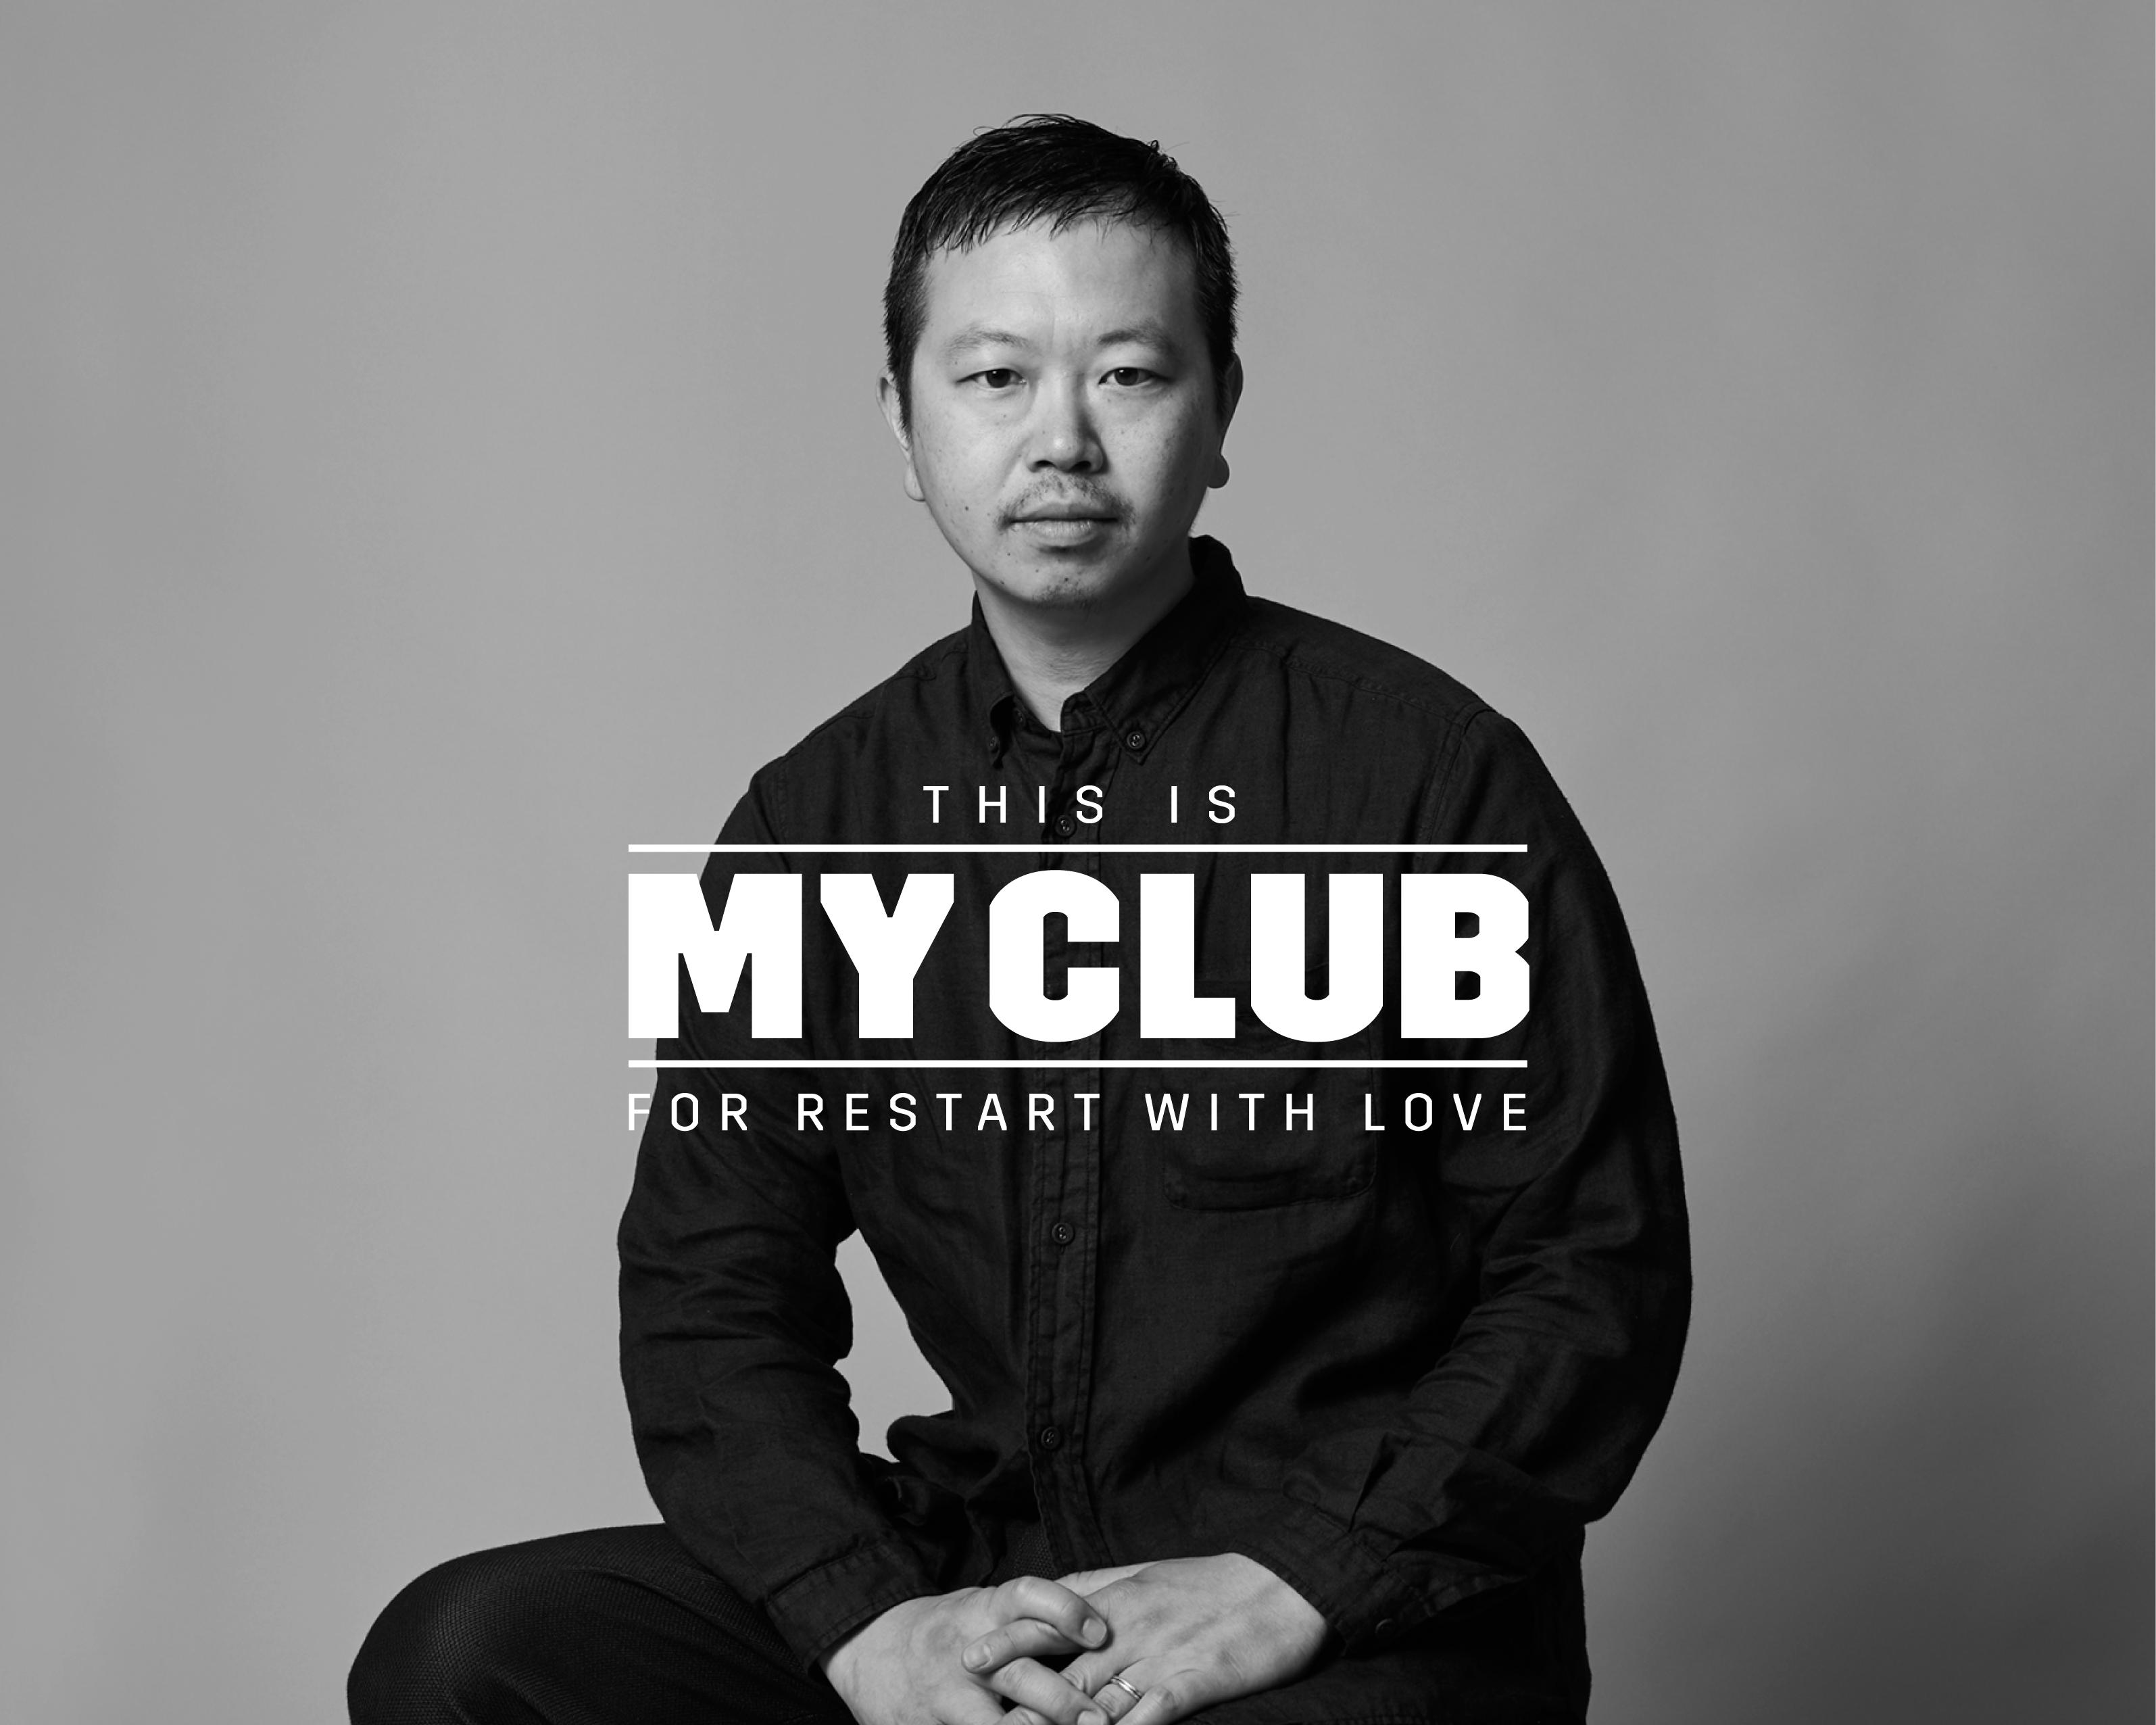 【THIS IS MY CLUB】相澤陽介(北海道コンサドーレ札幌 クリエイティブディレクター / White Mountaineering デザイナー)